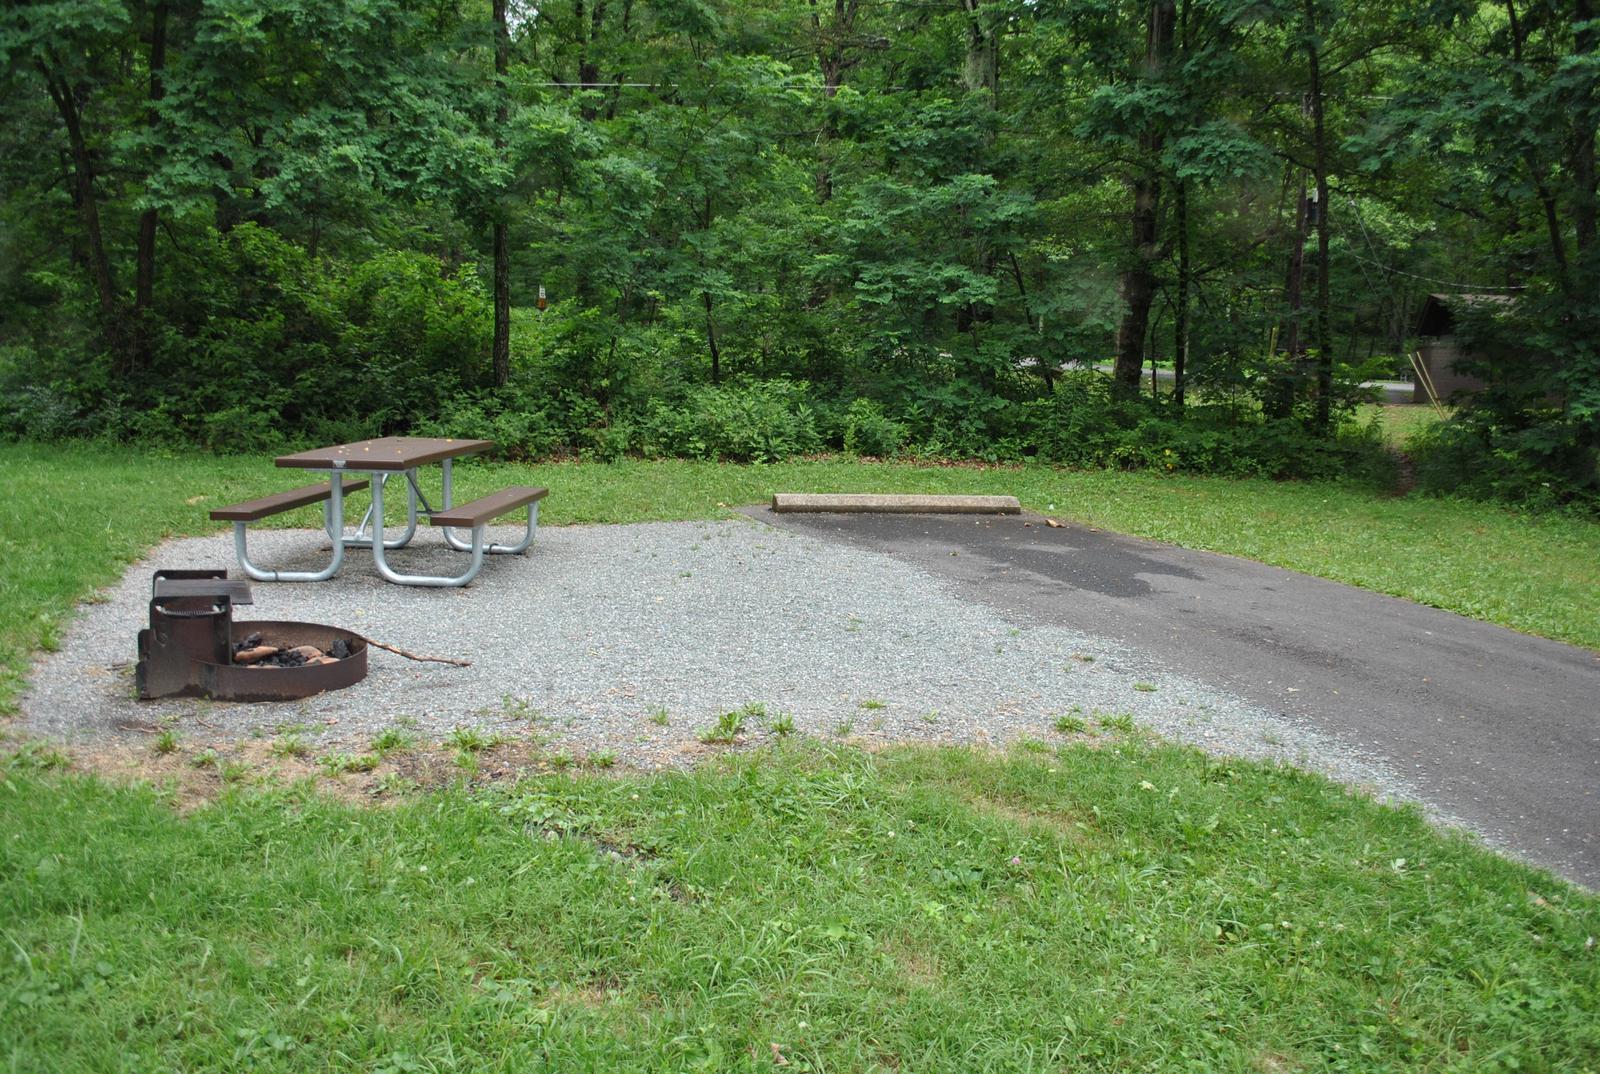 Mathews Arm Campground – Site A089